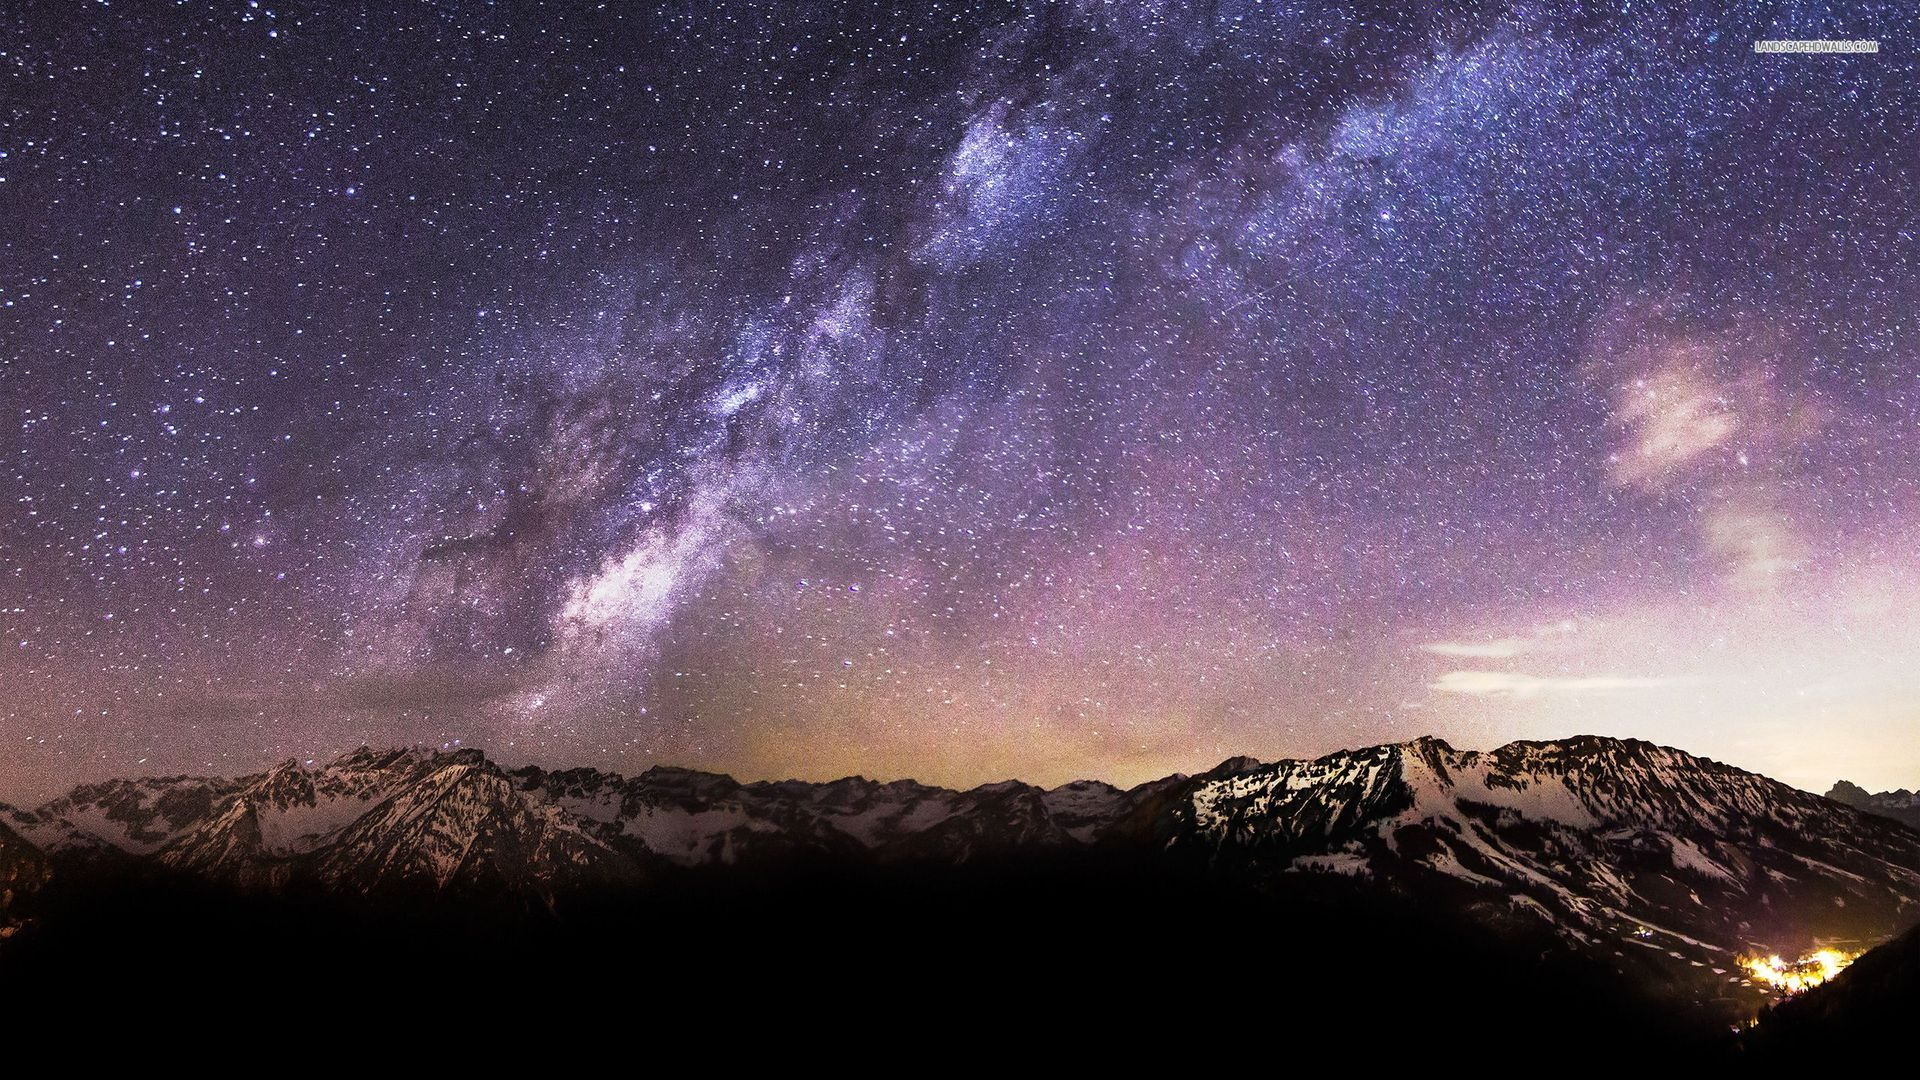 Milky Way Wallpaper 1920x1080 71 Images: 1080 P Wallpapers